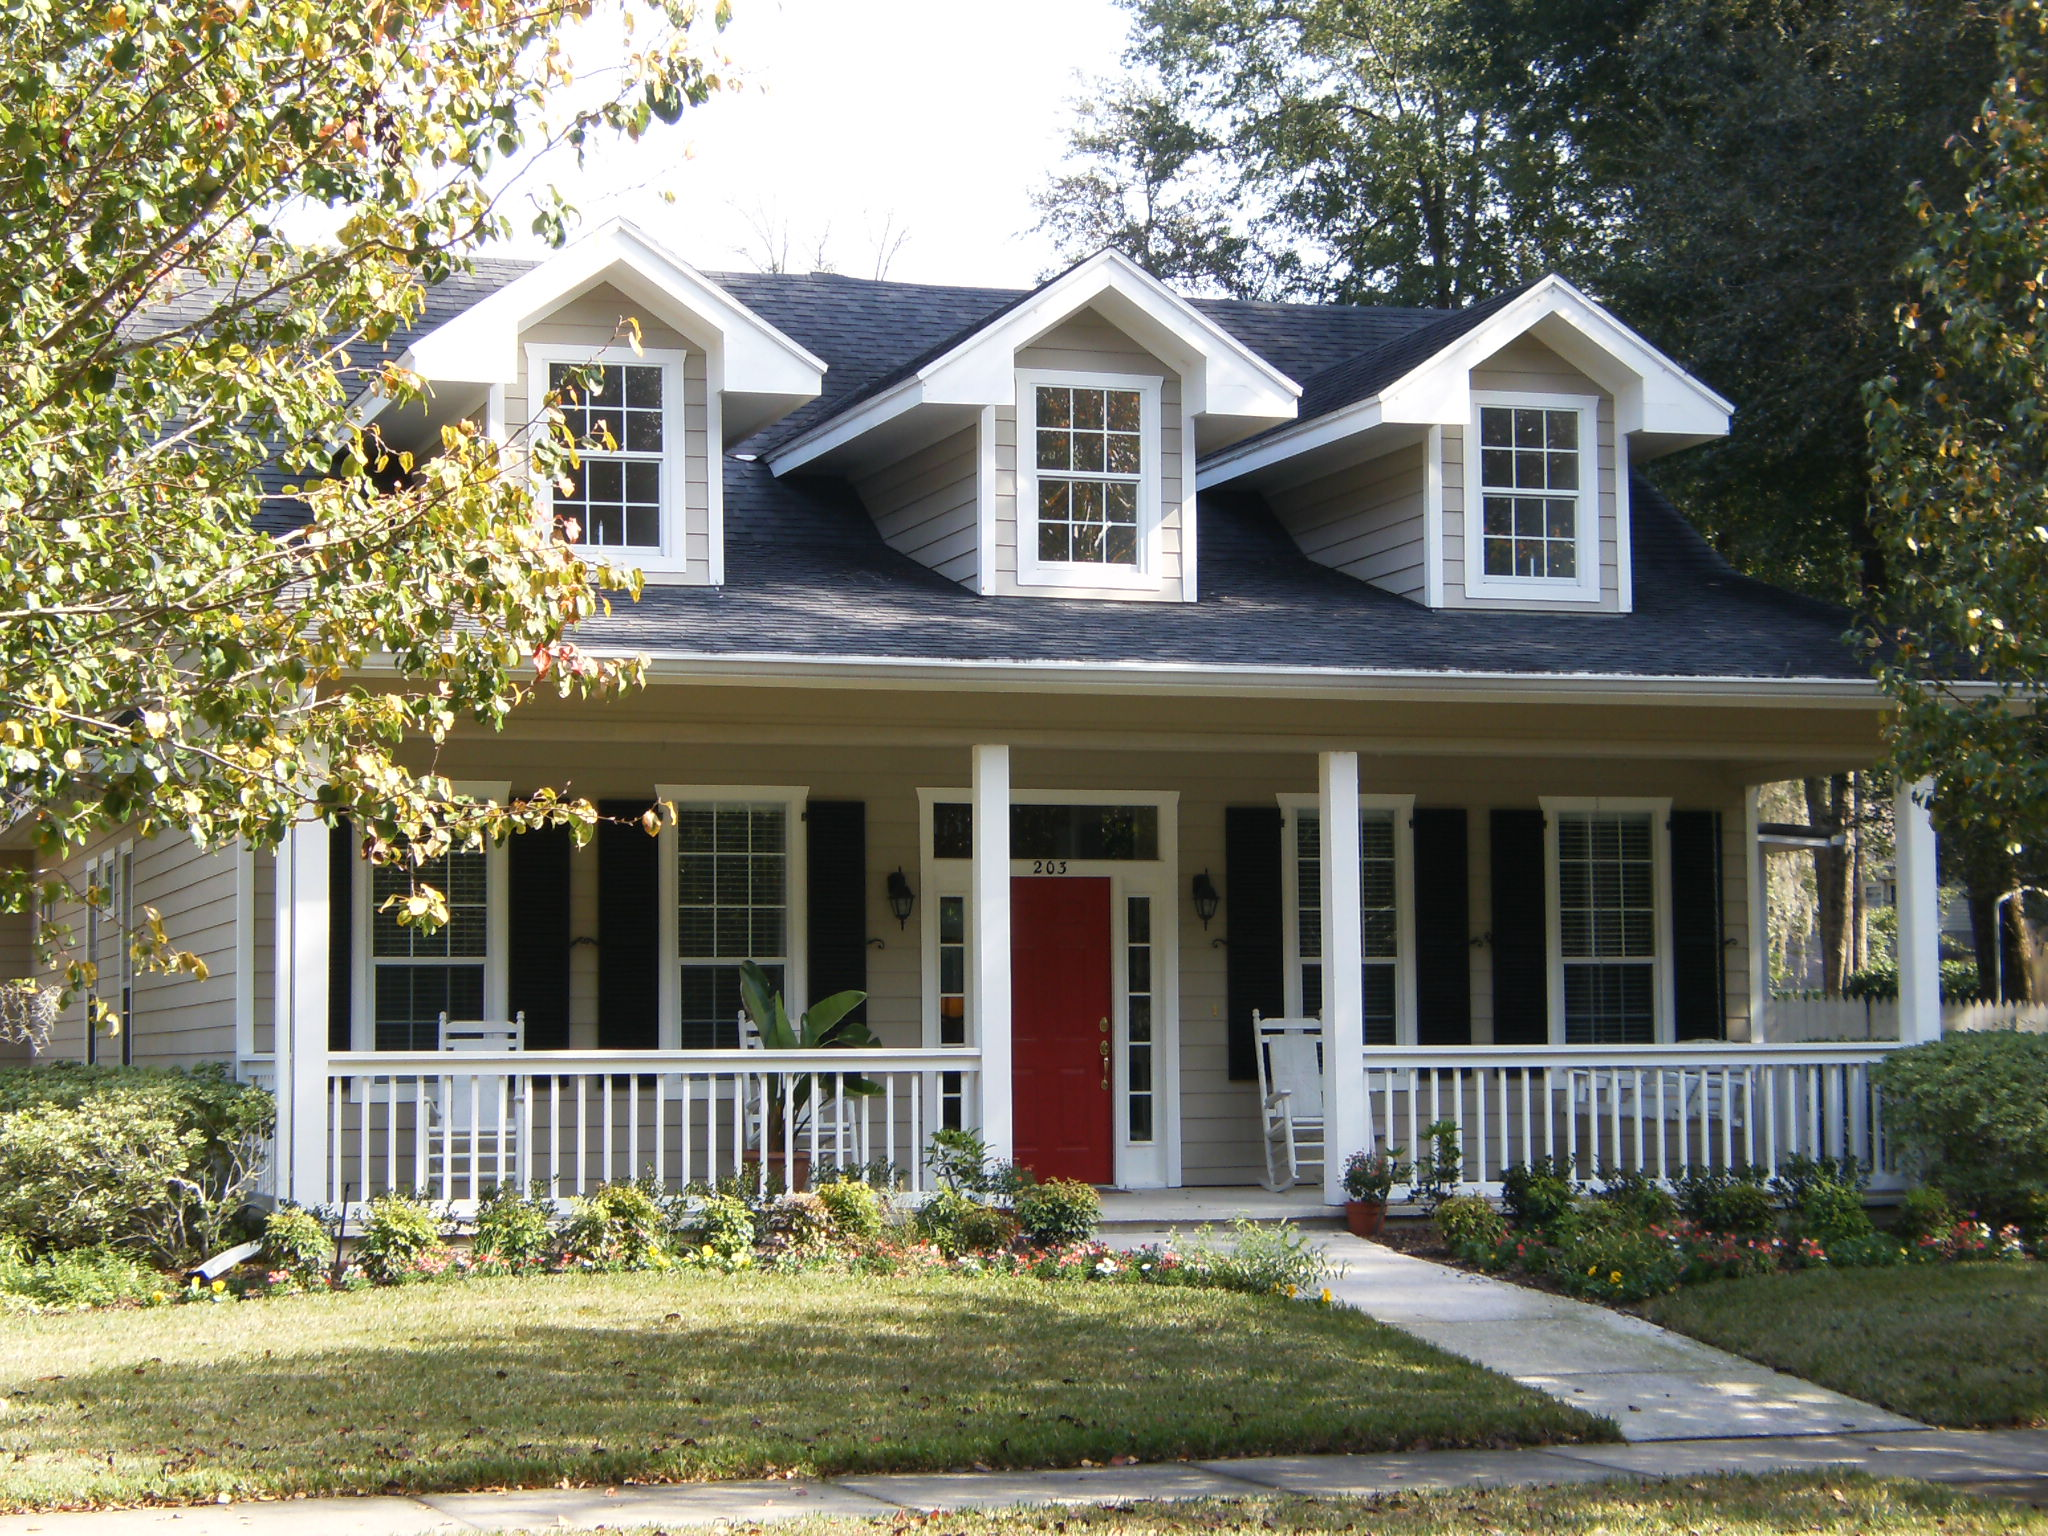 Plantas e modelos de casas estilo americano 17 modelos for Piani casa americana